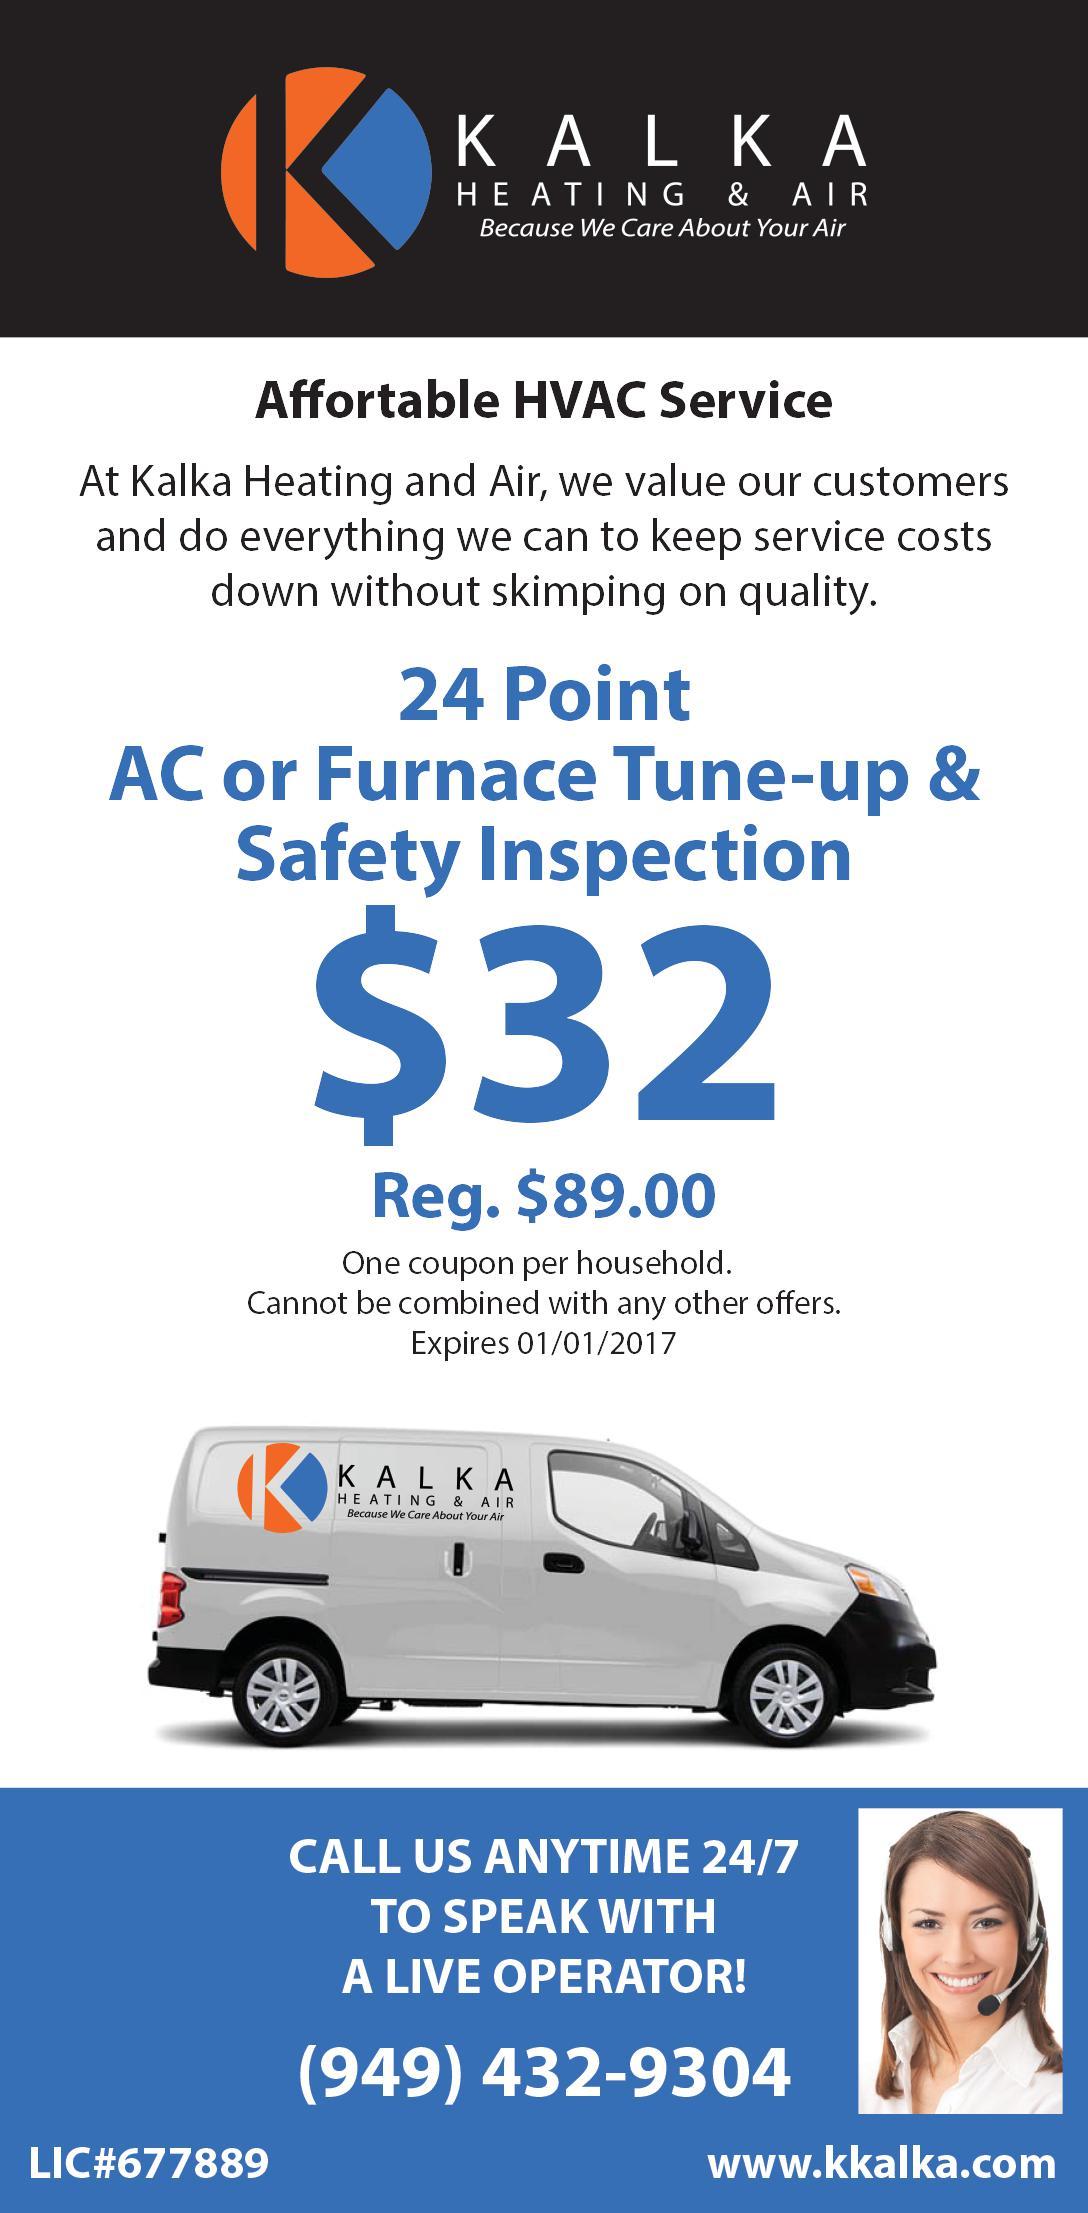 Kalka Heating and Air Conditioning